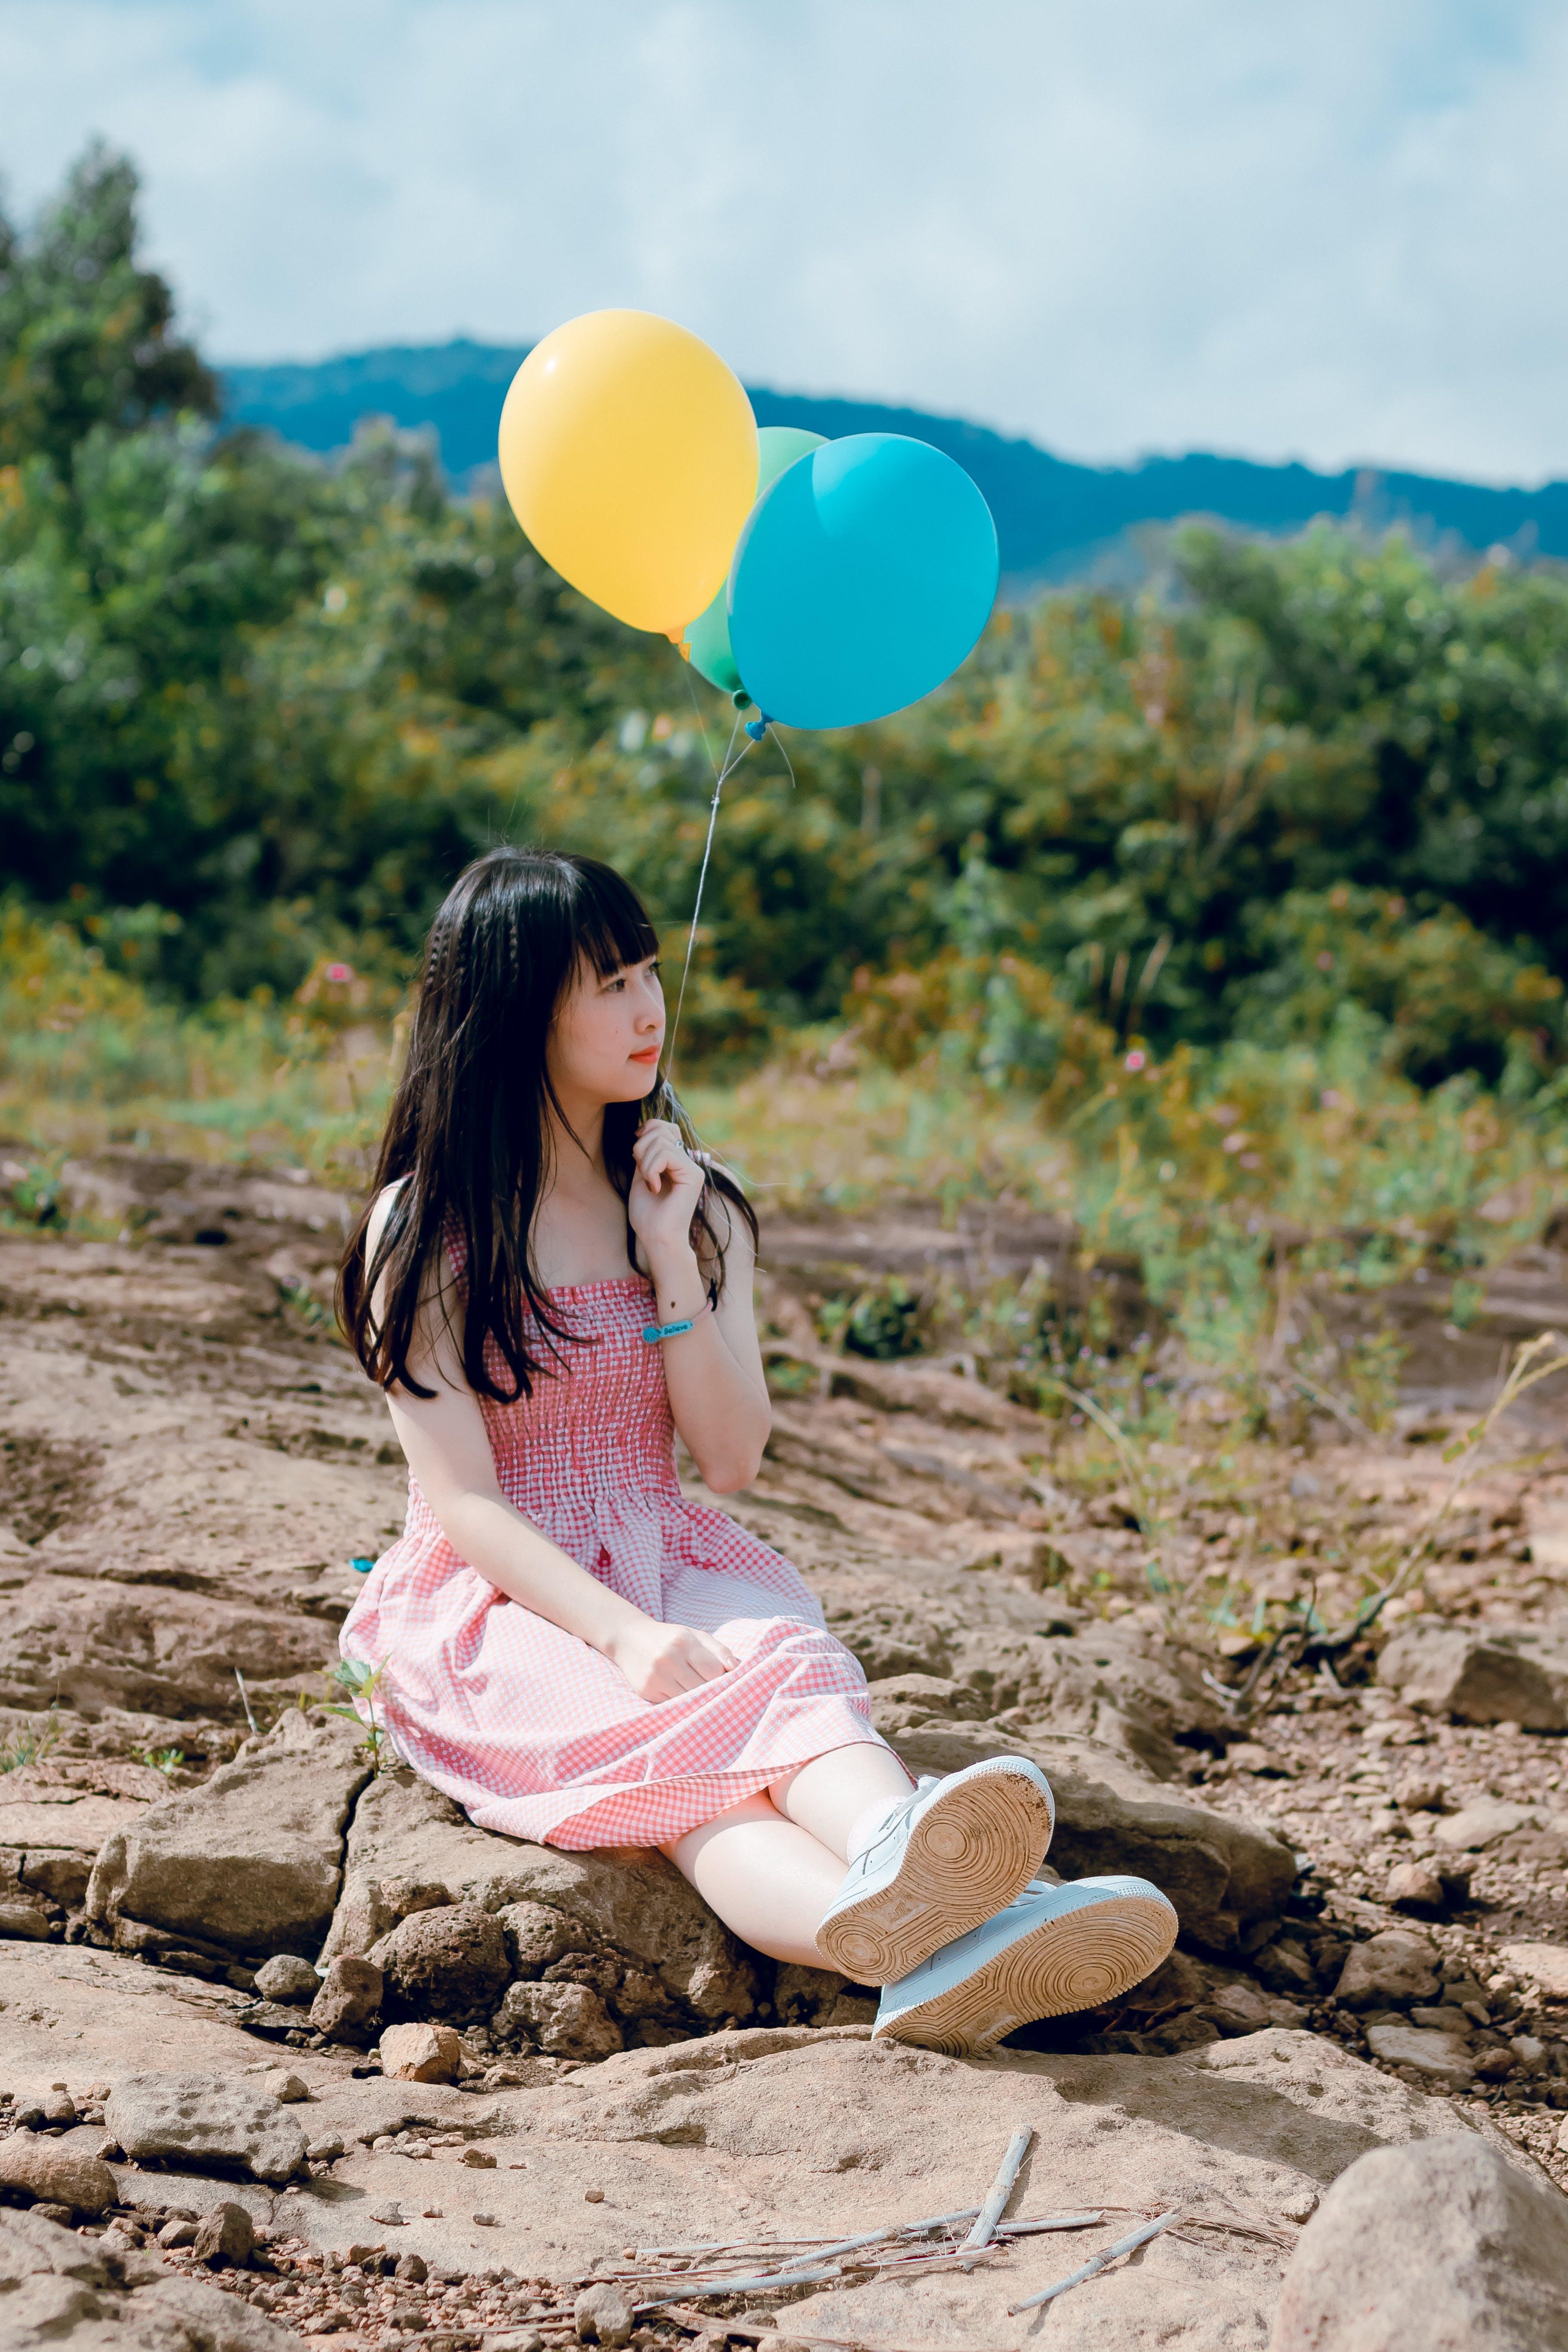 Kostenloses Stock Foto zu ballons, entspannung, erholung, frau